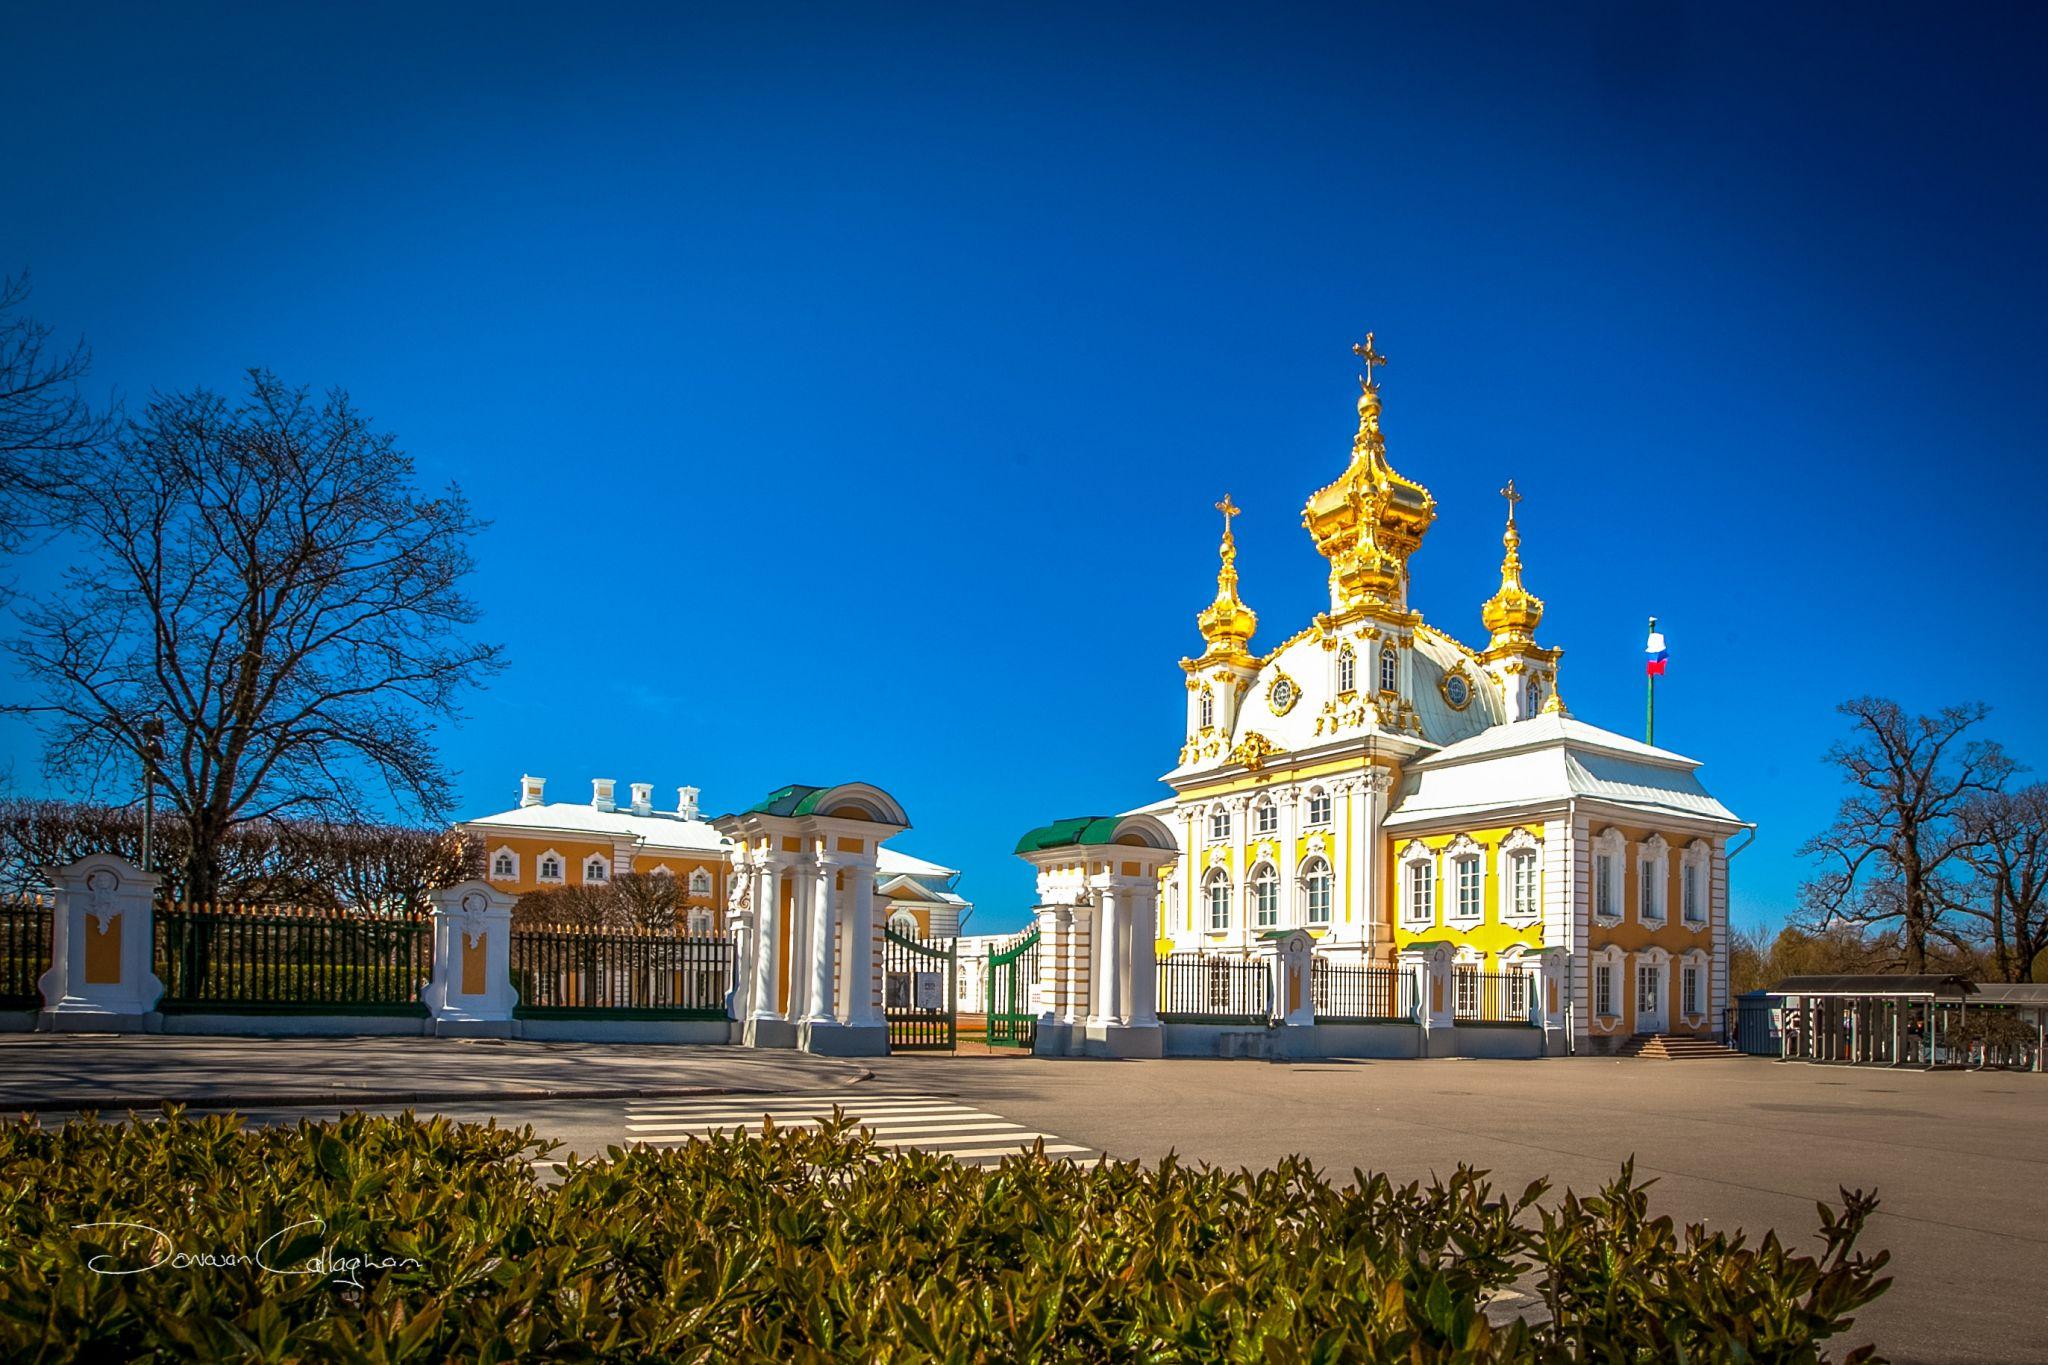 Palace Church Palace of Peterhof, St Petersburg, Russian Federation